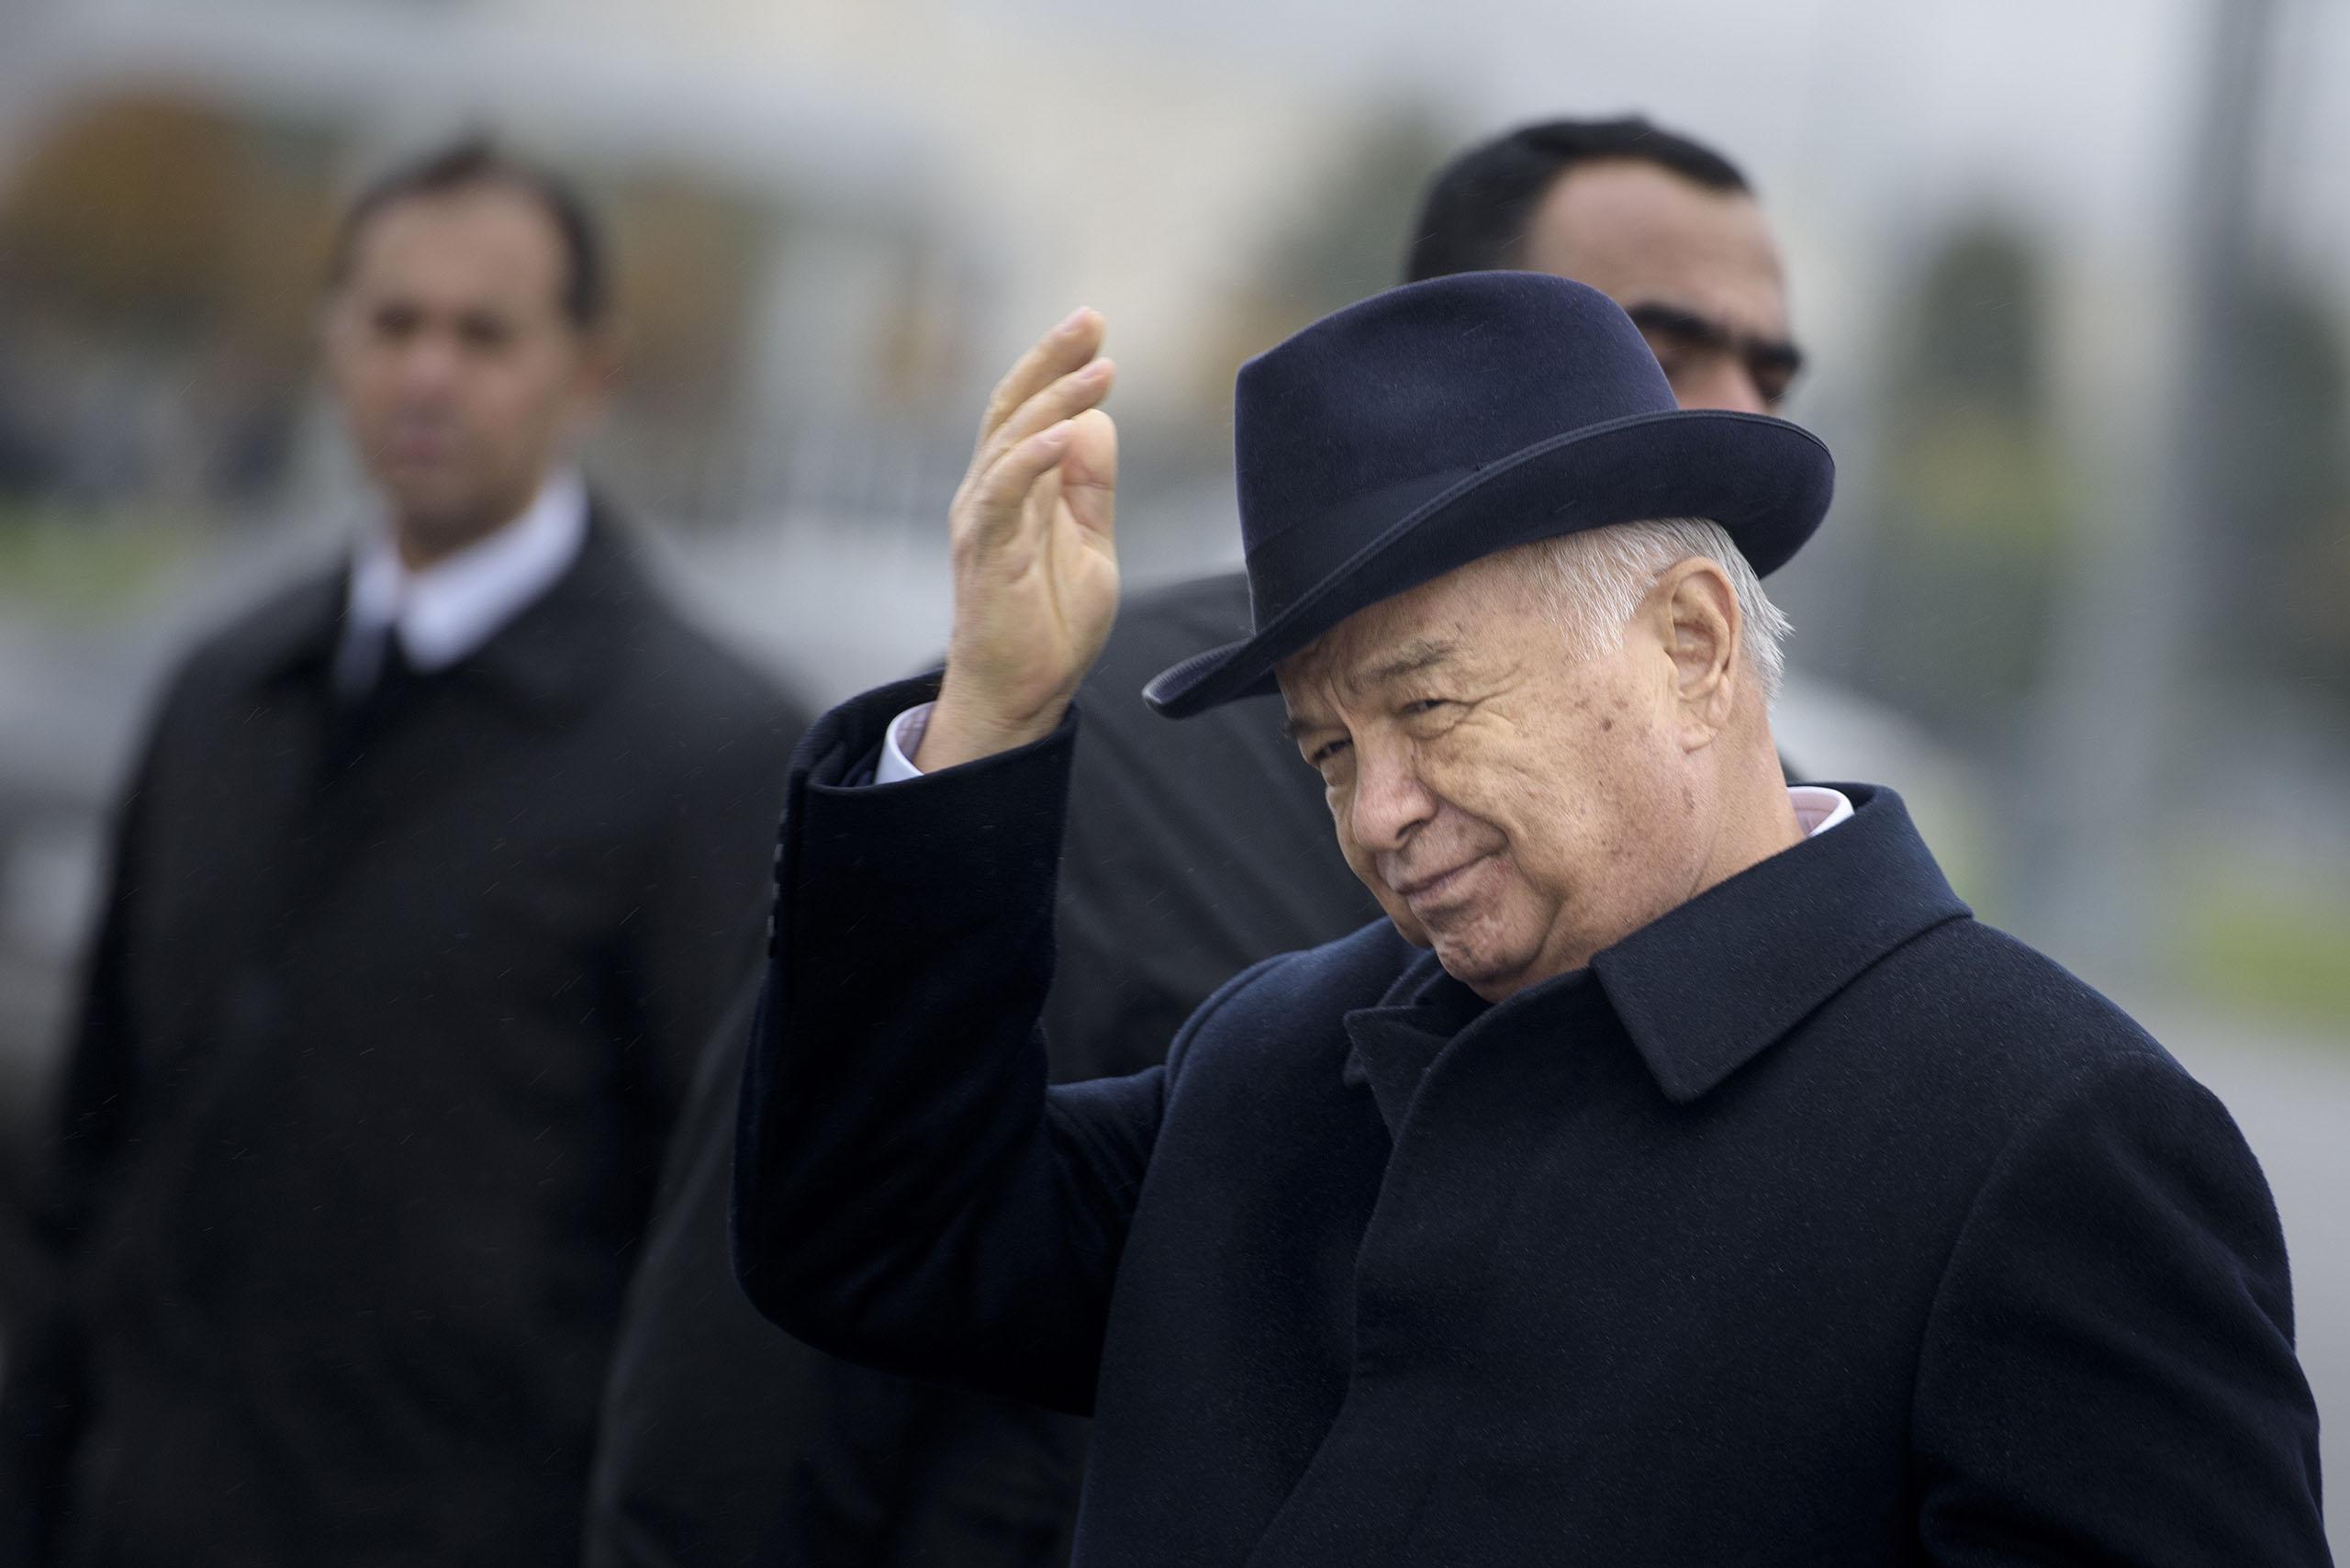 Uzbek President Islam Karimov gestures after greeting US Secretary of State John Kerry at Samarkand Airport on Nov. 1, 2015.